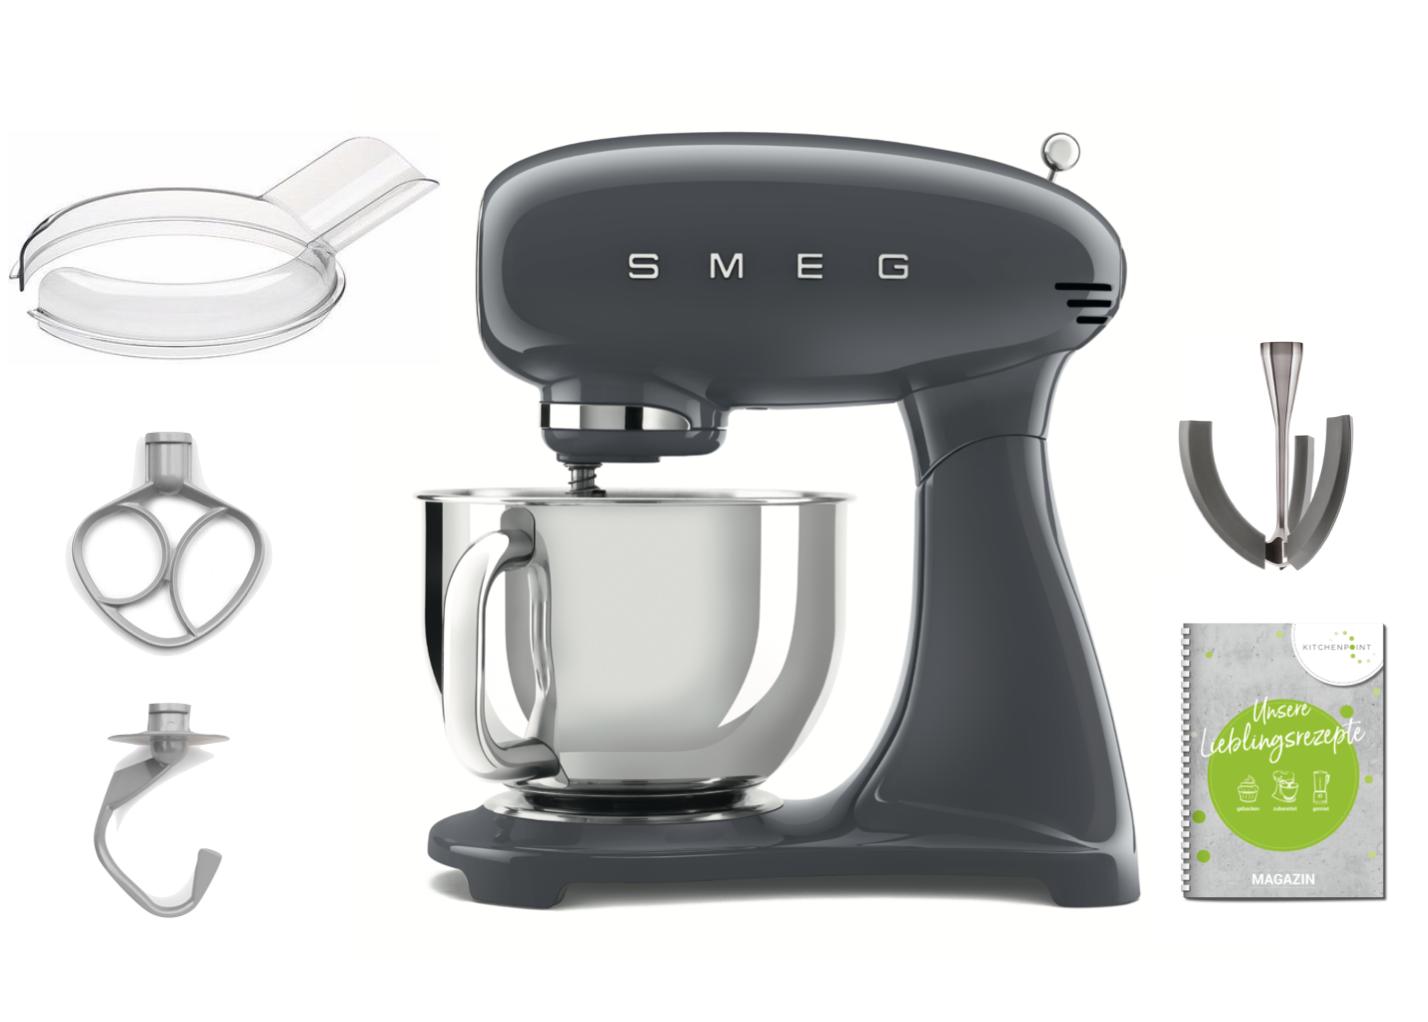 SMEG Küchenmaschine Anthrazit-grau